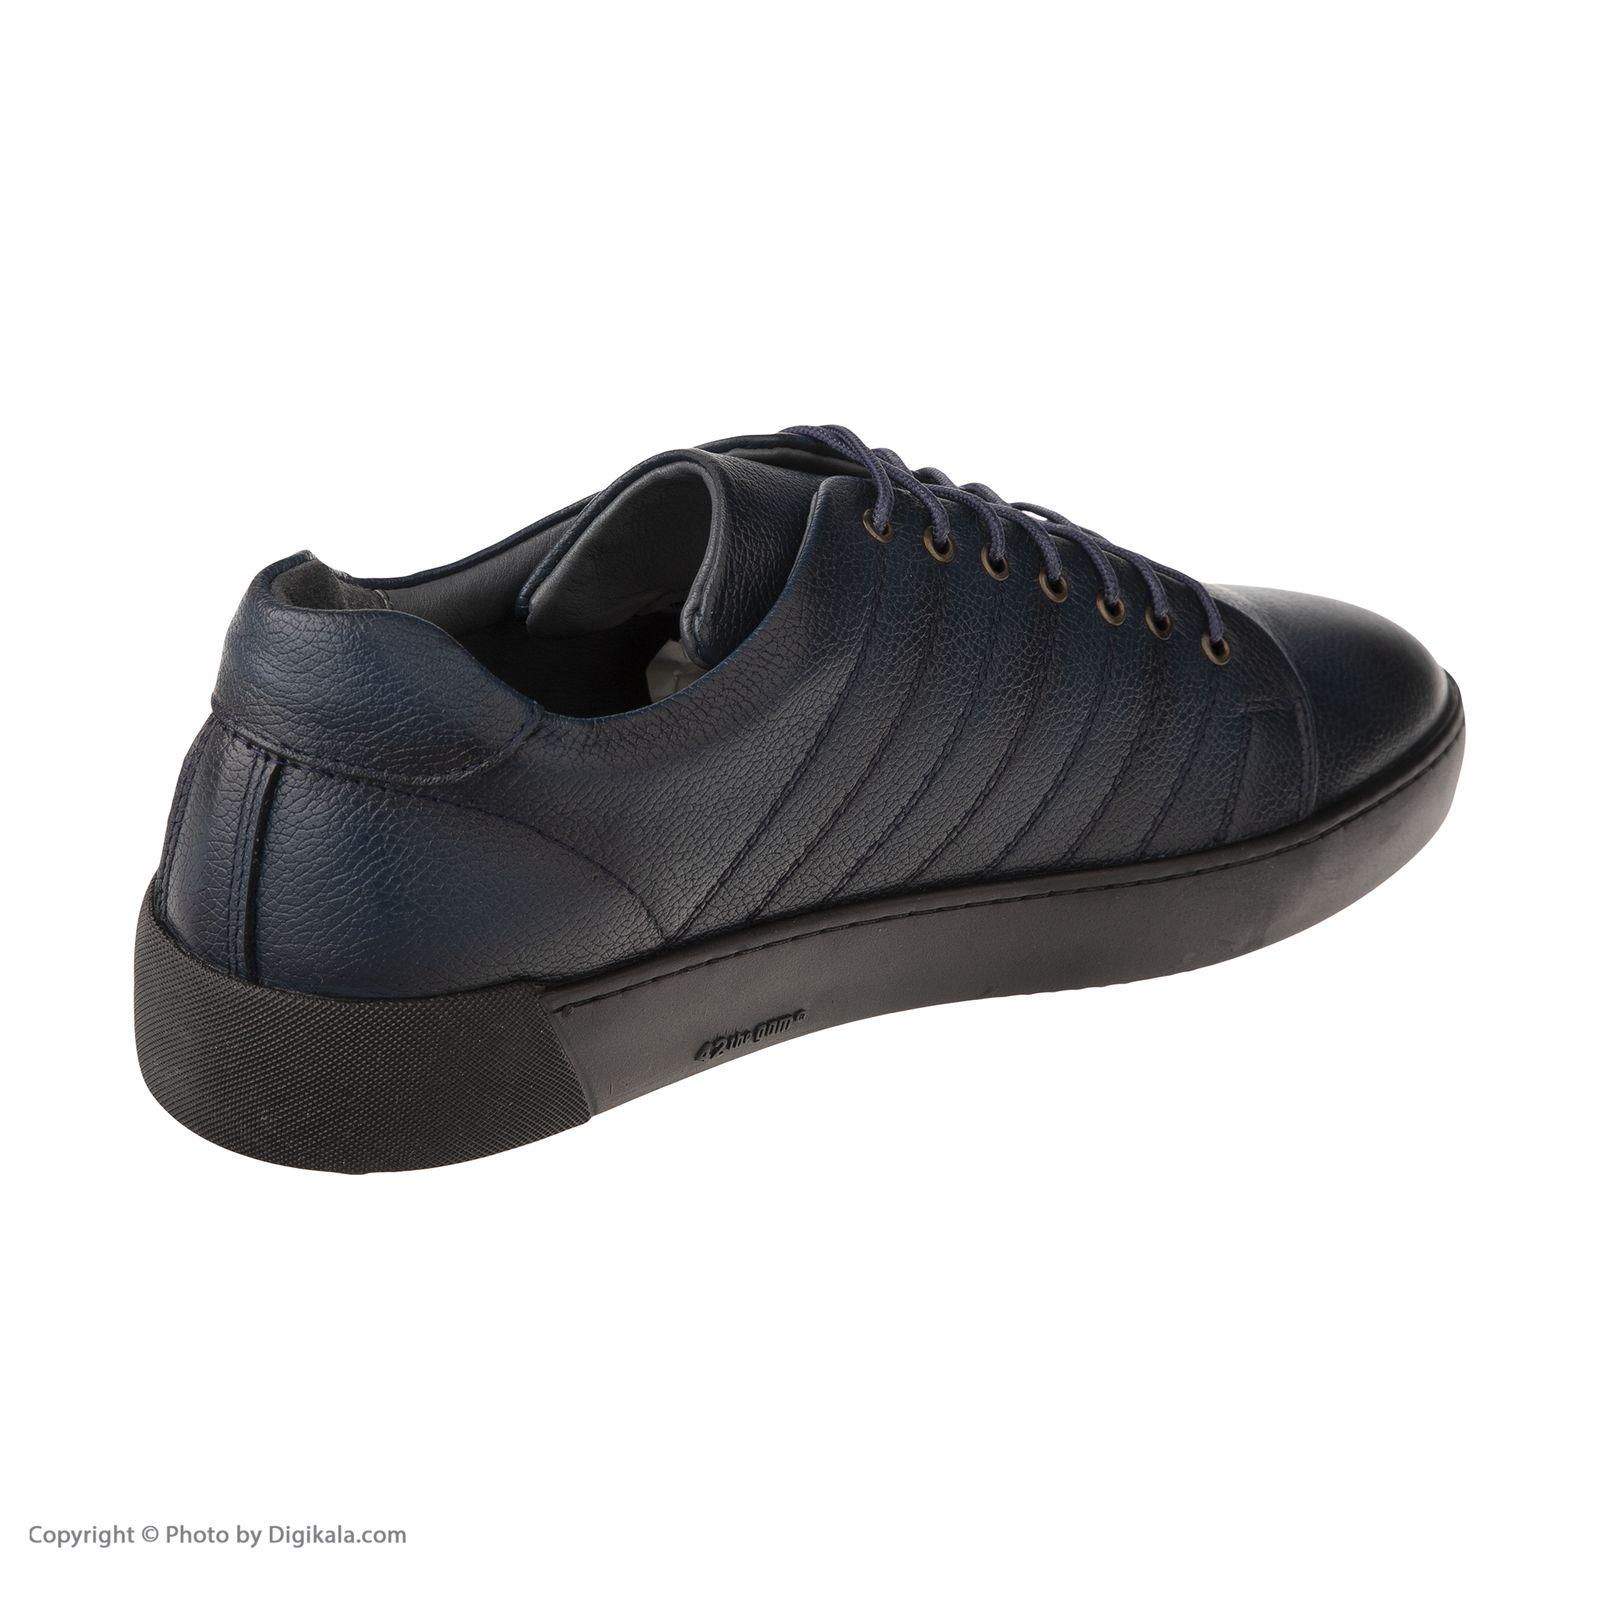 کفش روزمره مردانه شیفر مدل 7359A503103 -  - 6